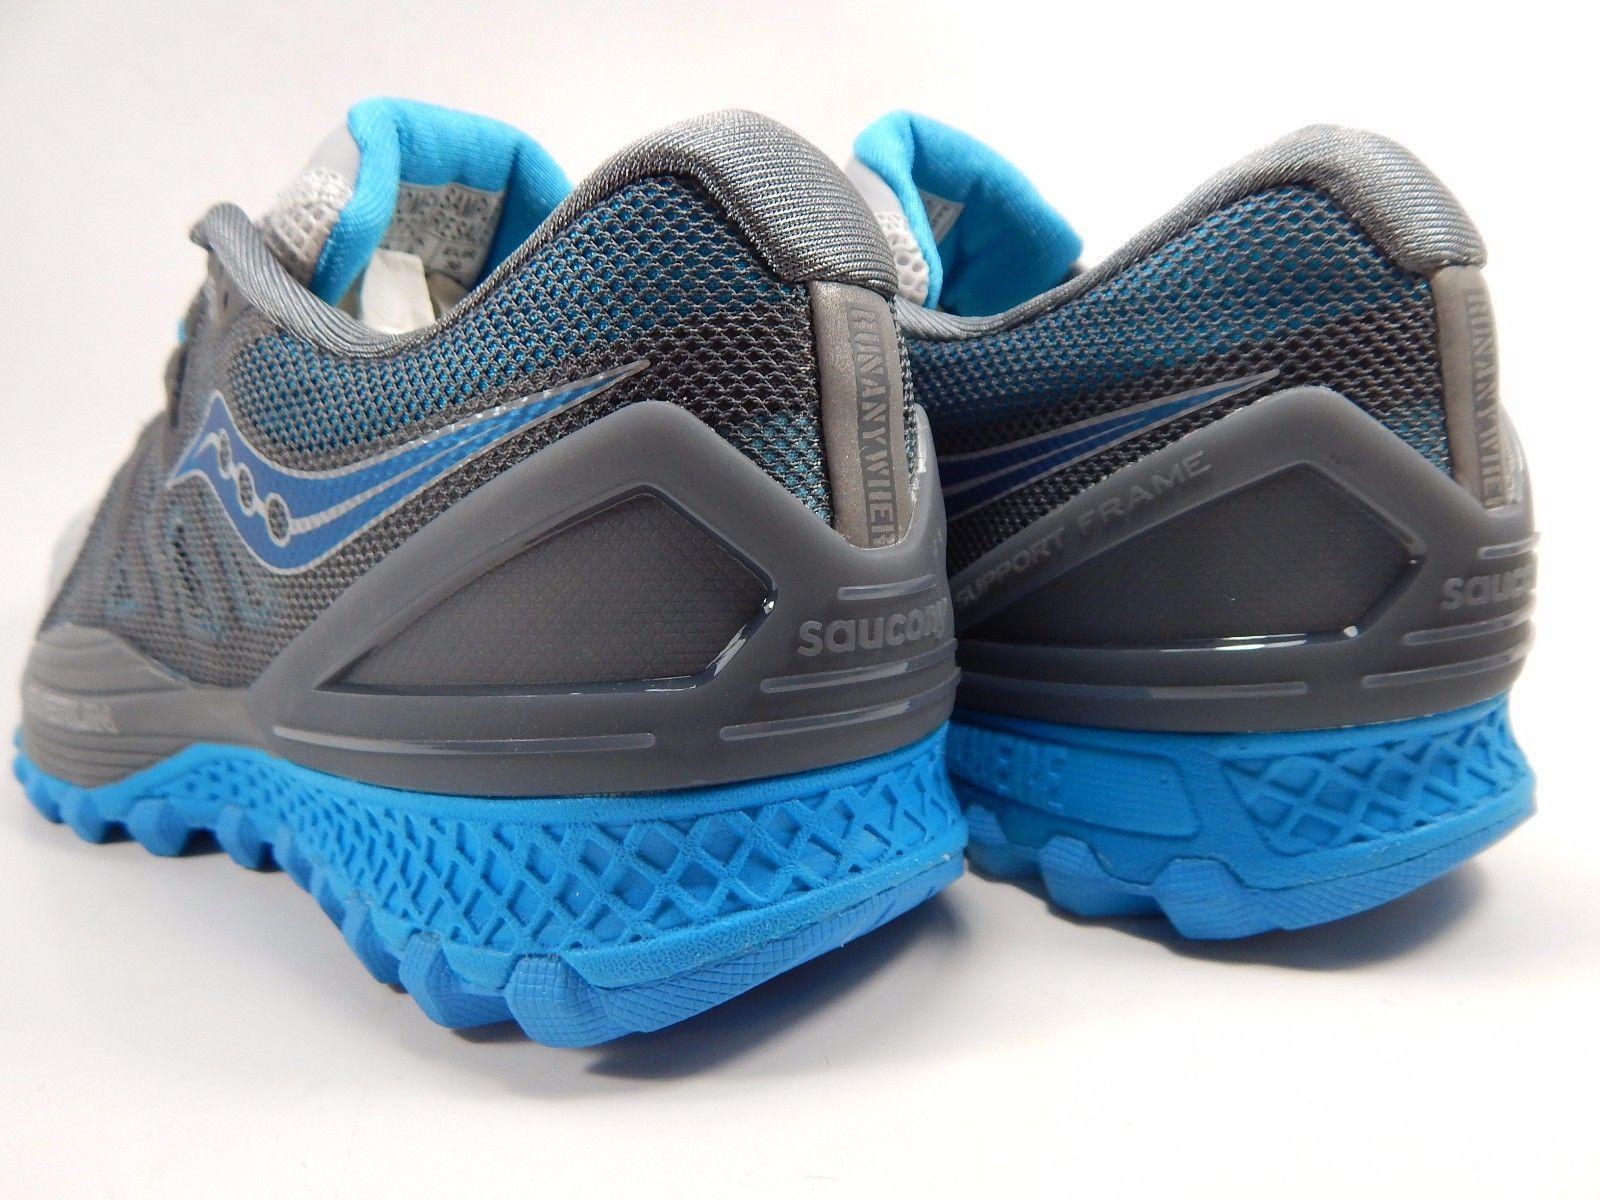 Saucony Xodus ISO 2 Women's Running Shoes Size US 8 M (B) EU 39 Gray S10387-2